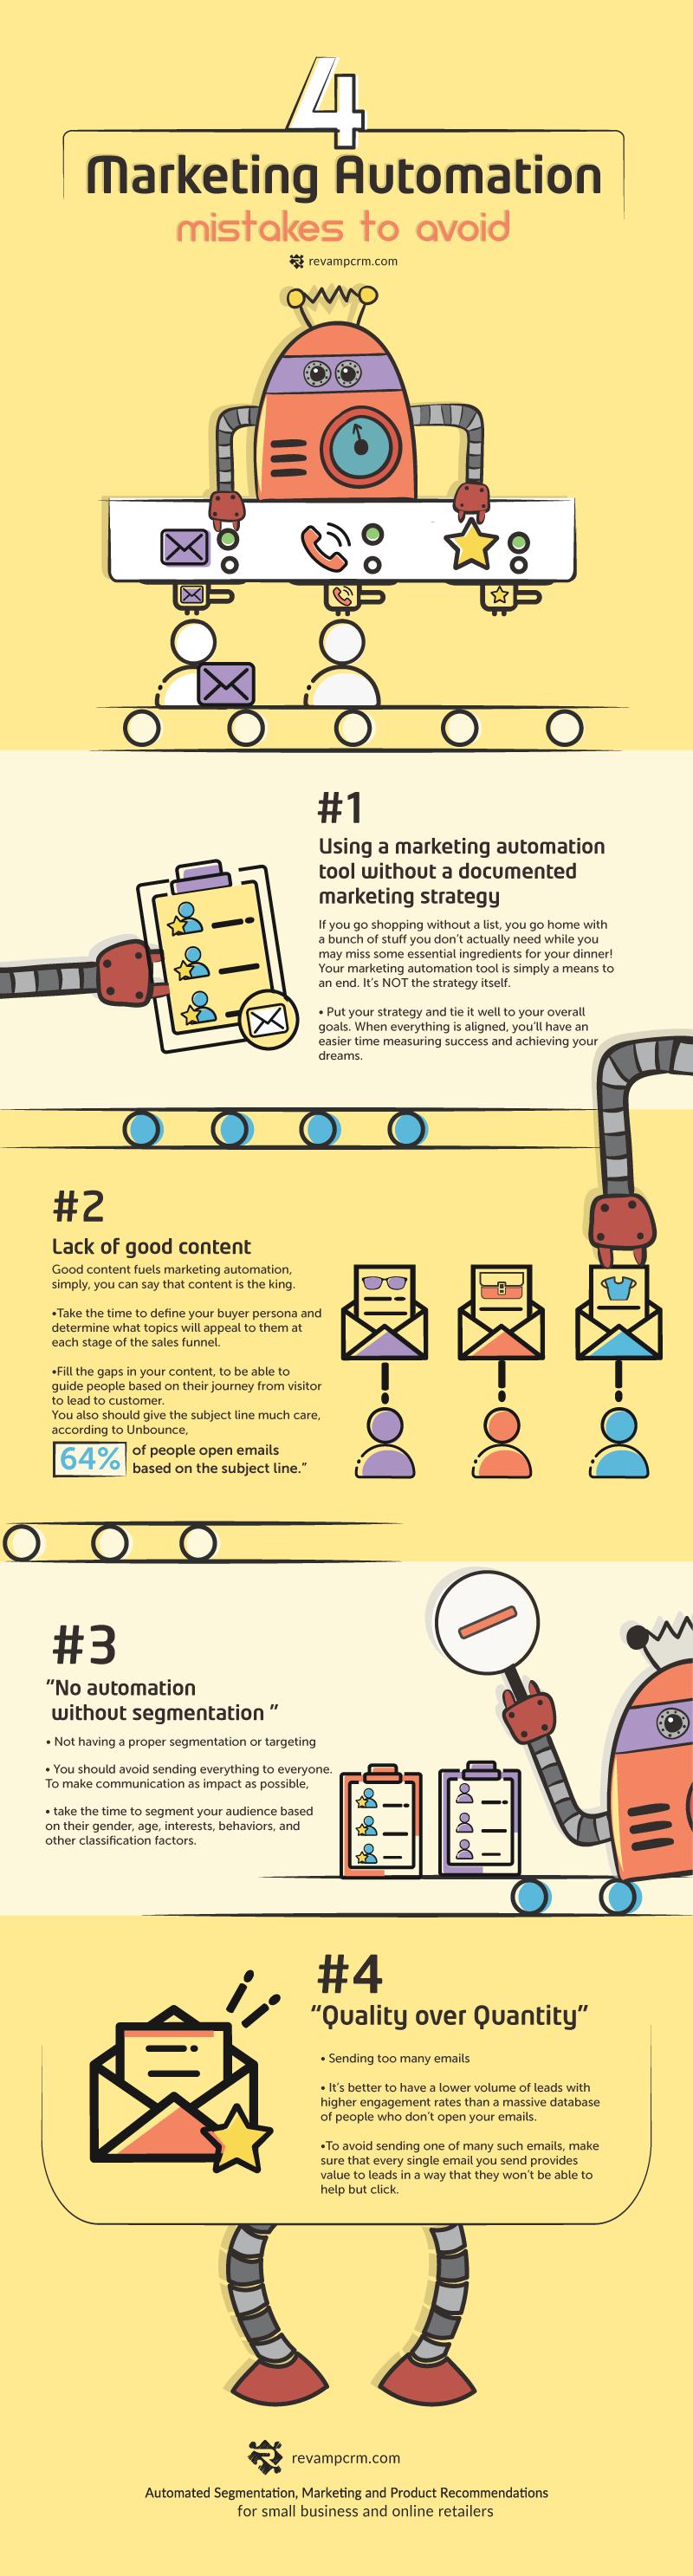 marketing-automation-mistakes2